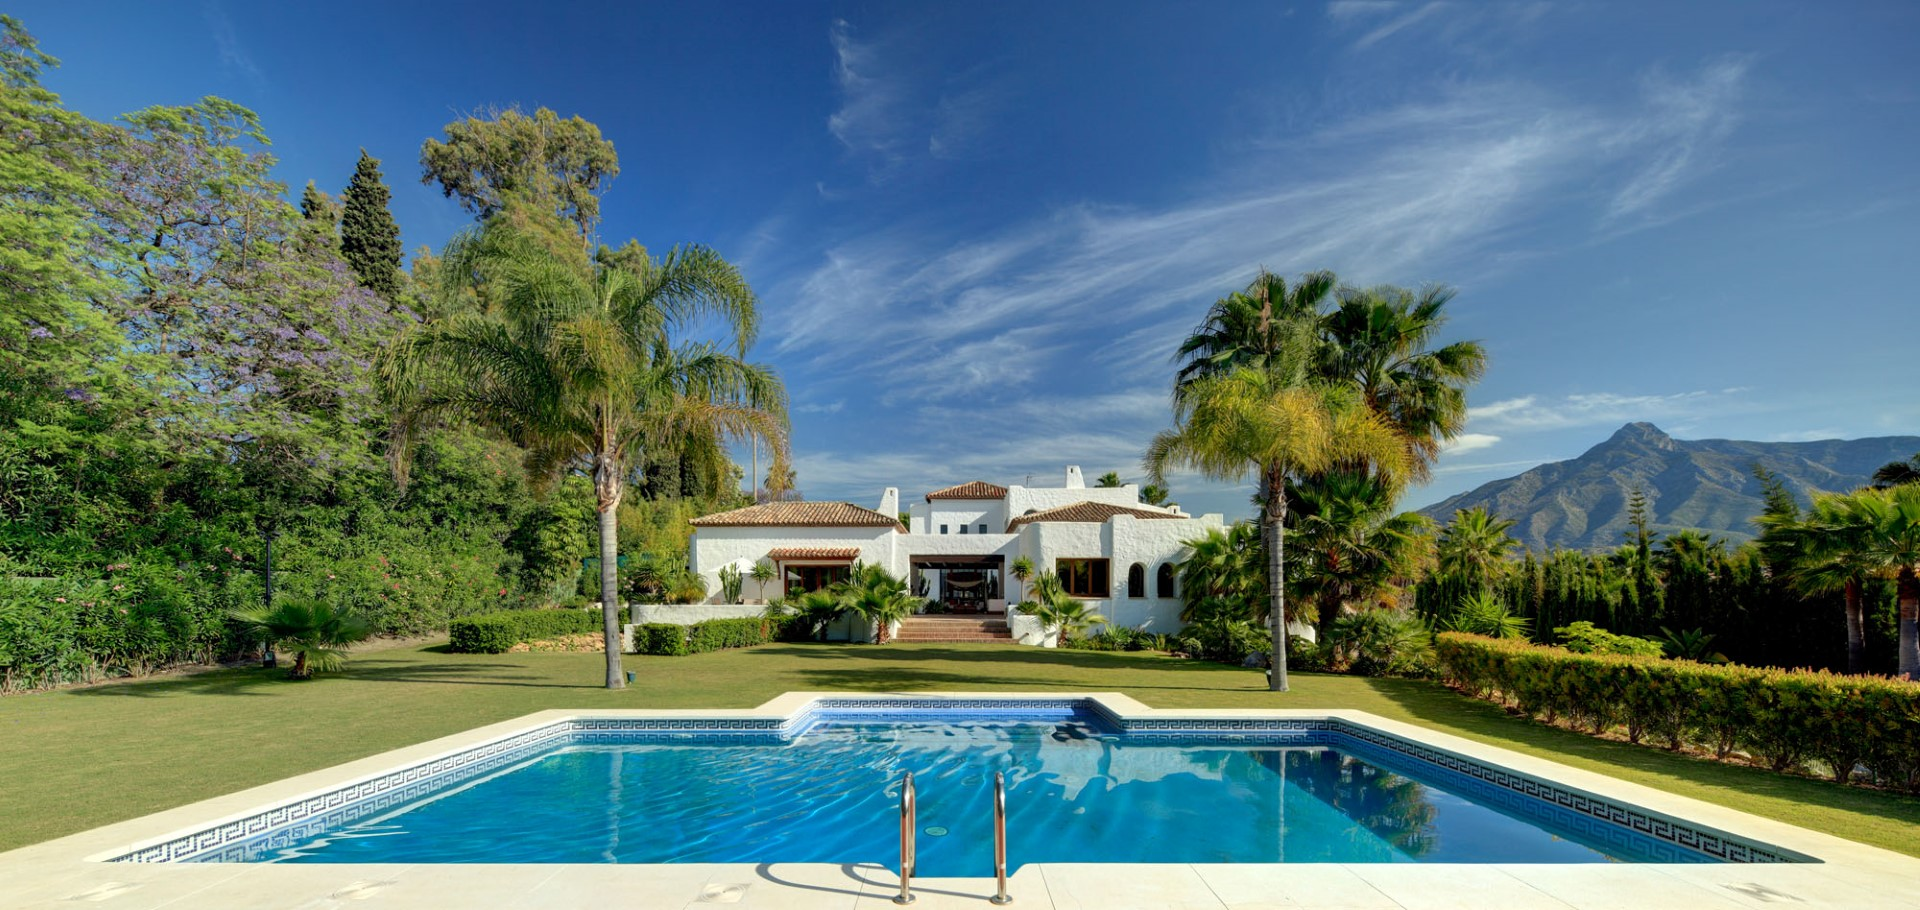 Luxury villas for rent in marbella - Luxury homes marbella ...